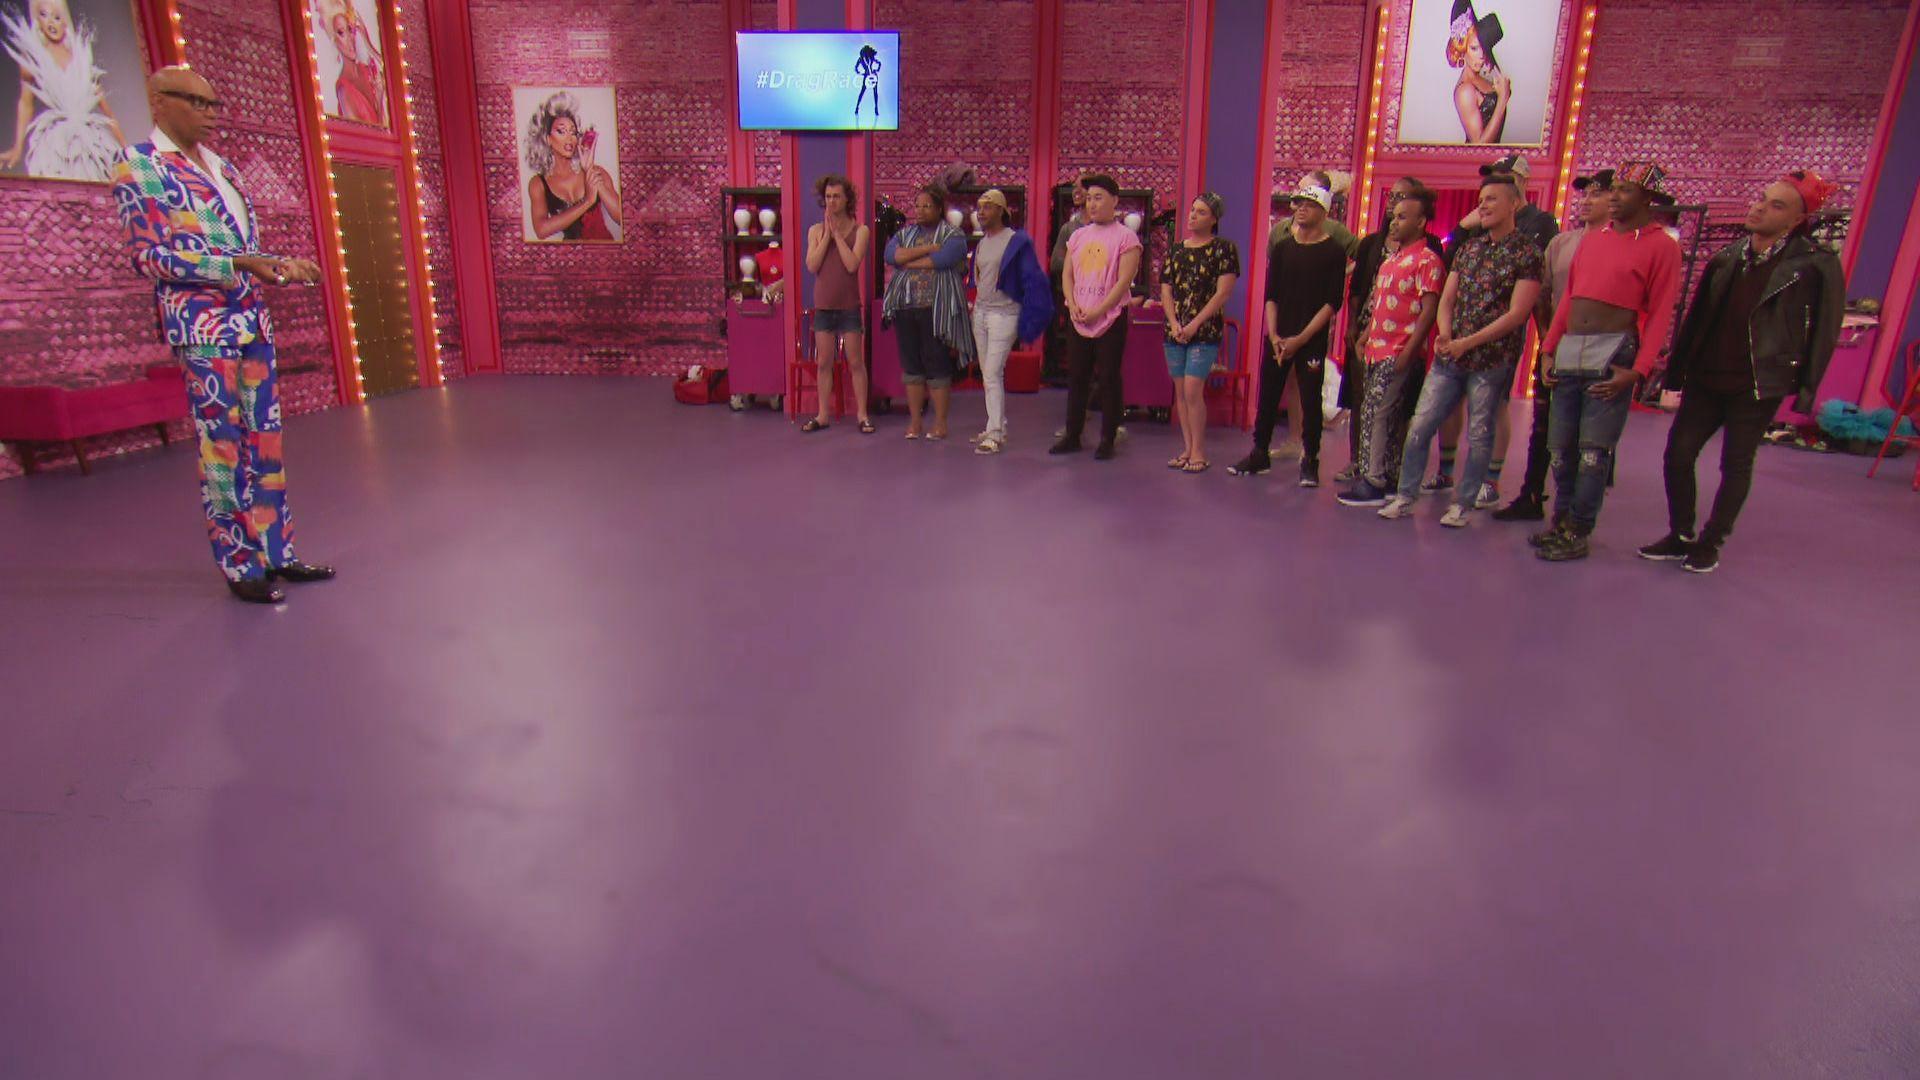 Use Policy >> RuPaul's Drag Race - Season 11, Ep. 1 - Whatcha Unpackin